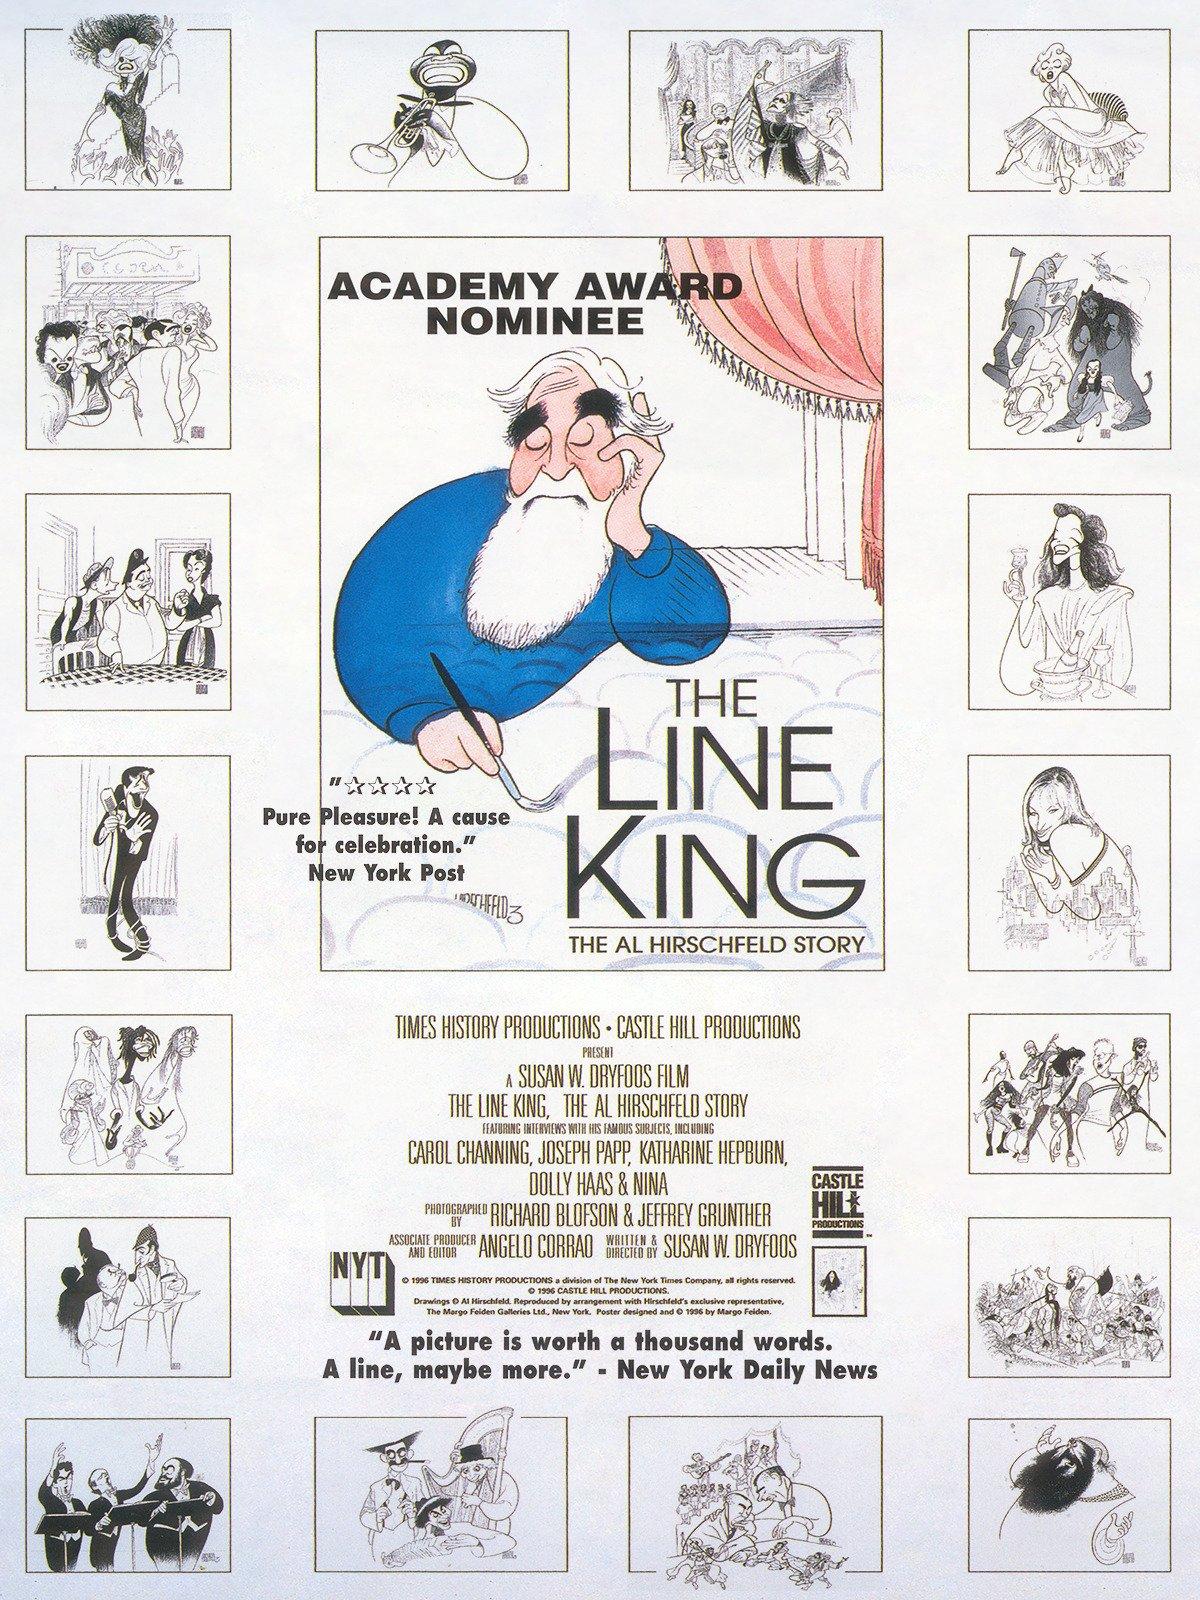 Amazon com: Watch The Line King: The Al Hirschfeld Story | Prime Video